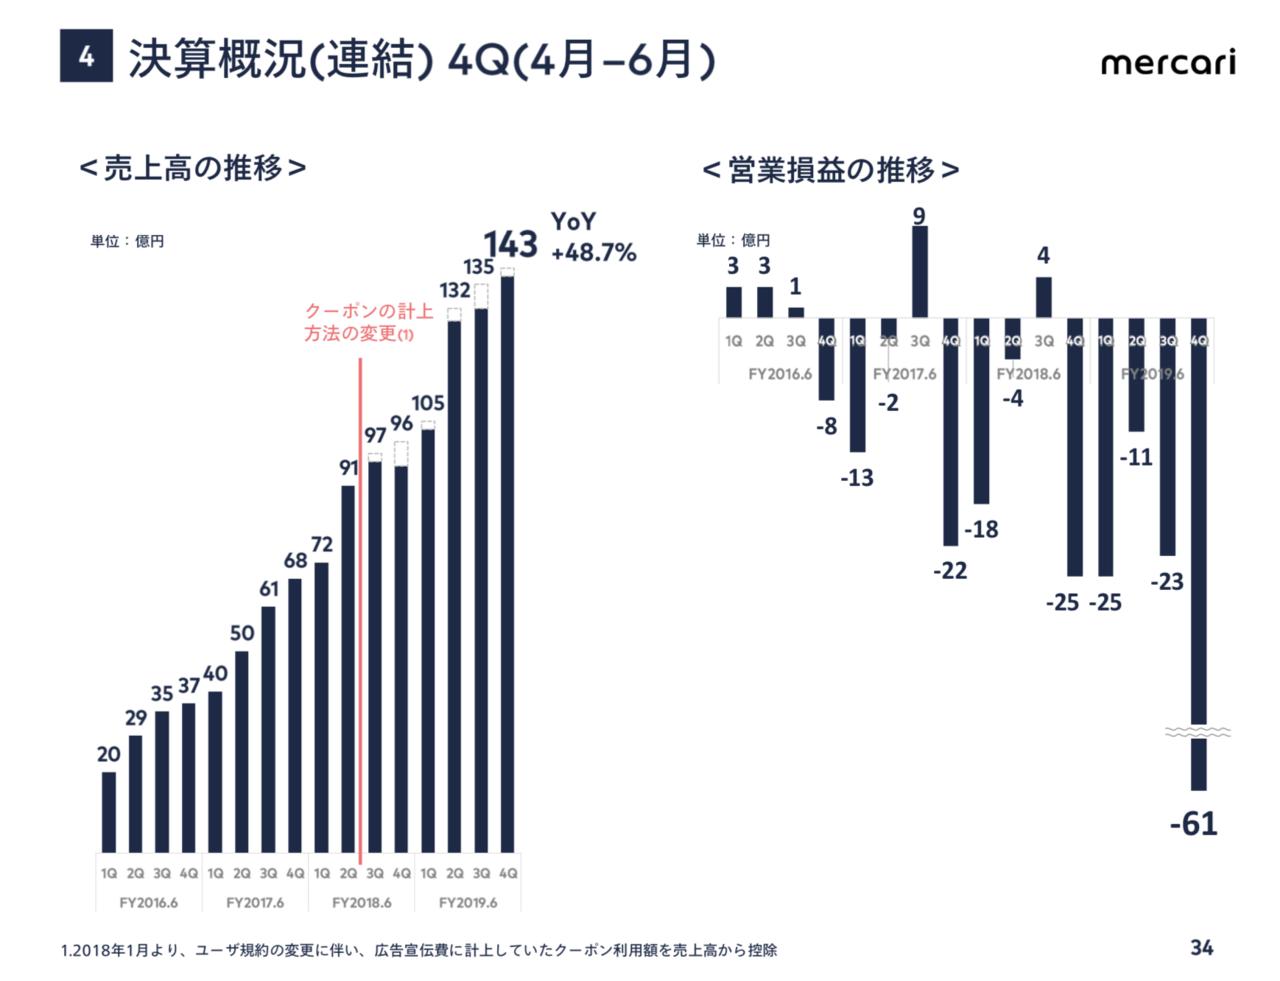 出典:株式会社メルカリ FY2019.6 4Q 決算説明会資料